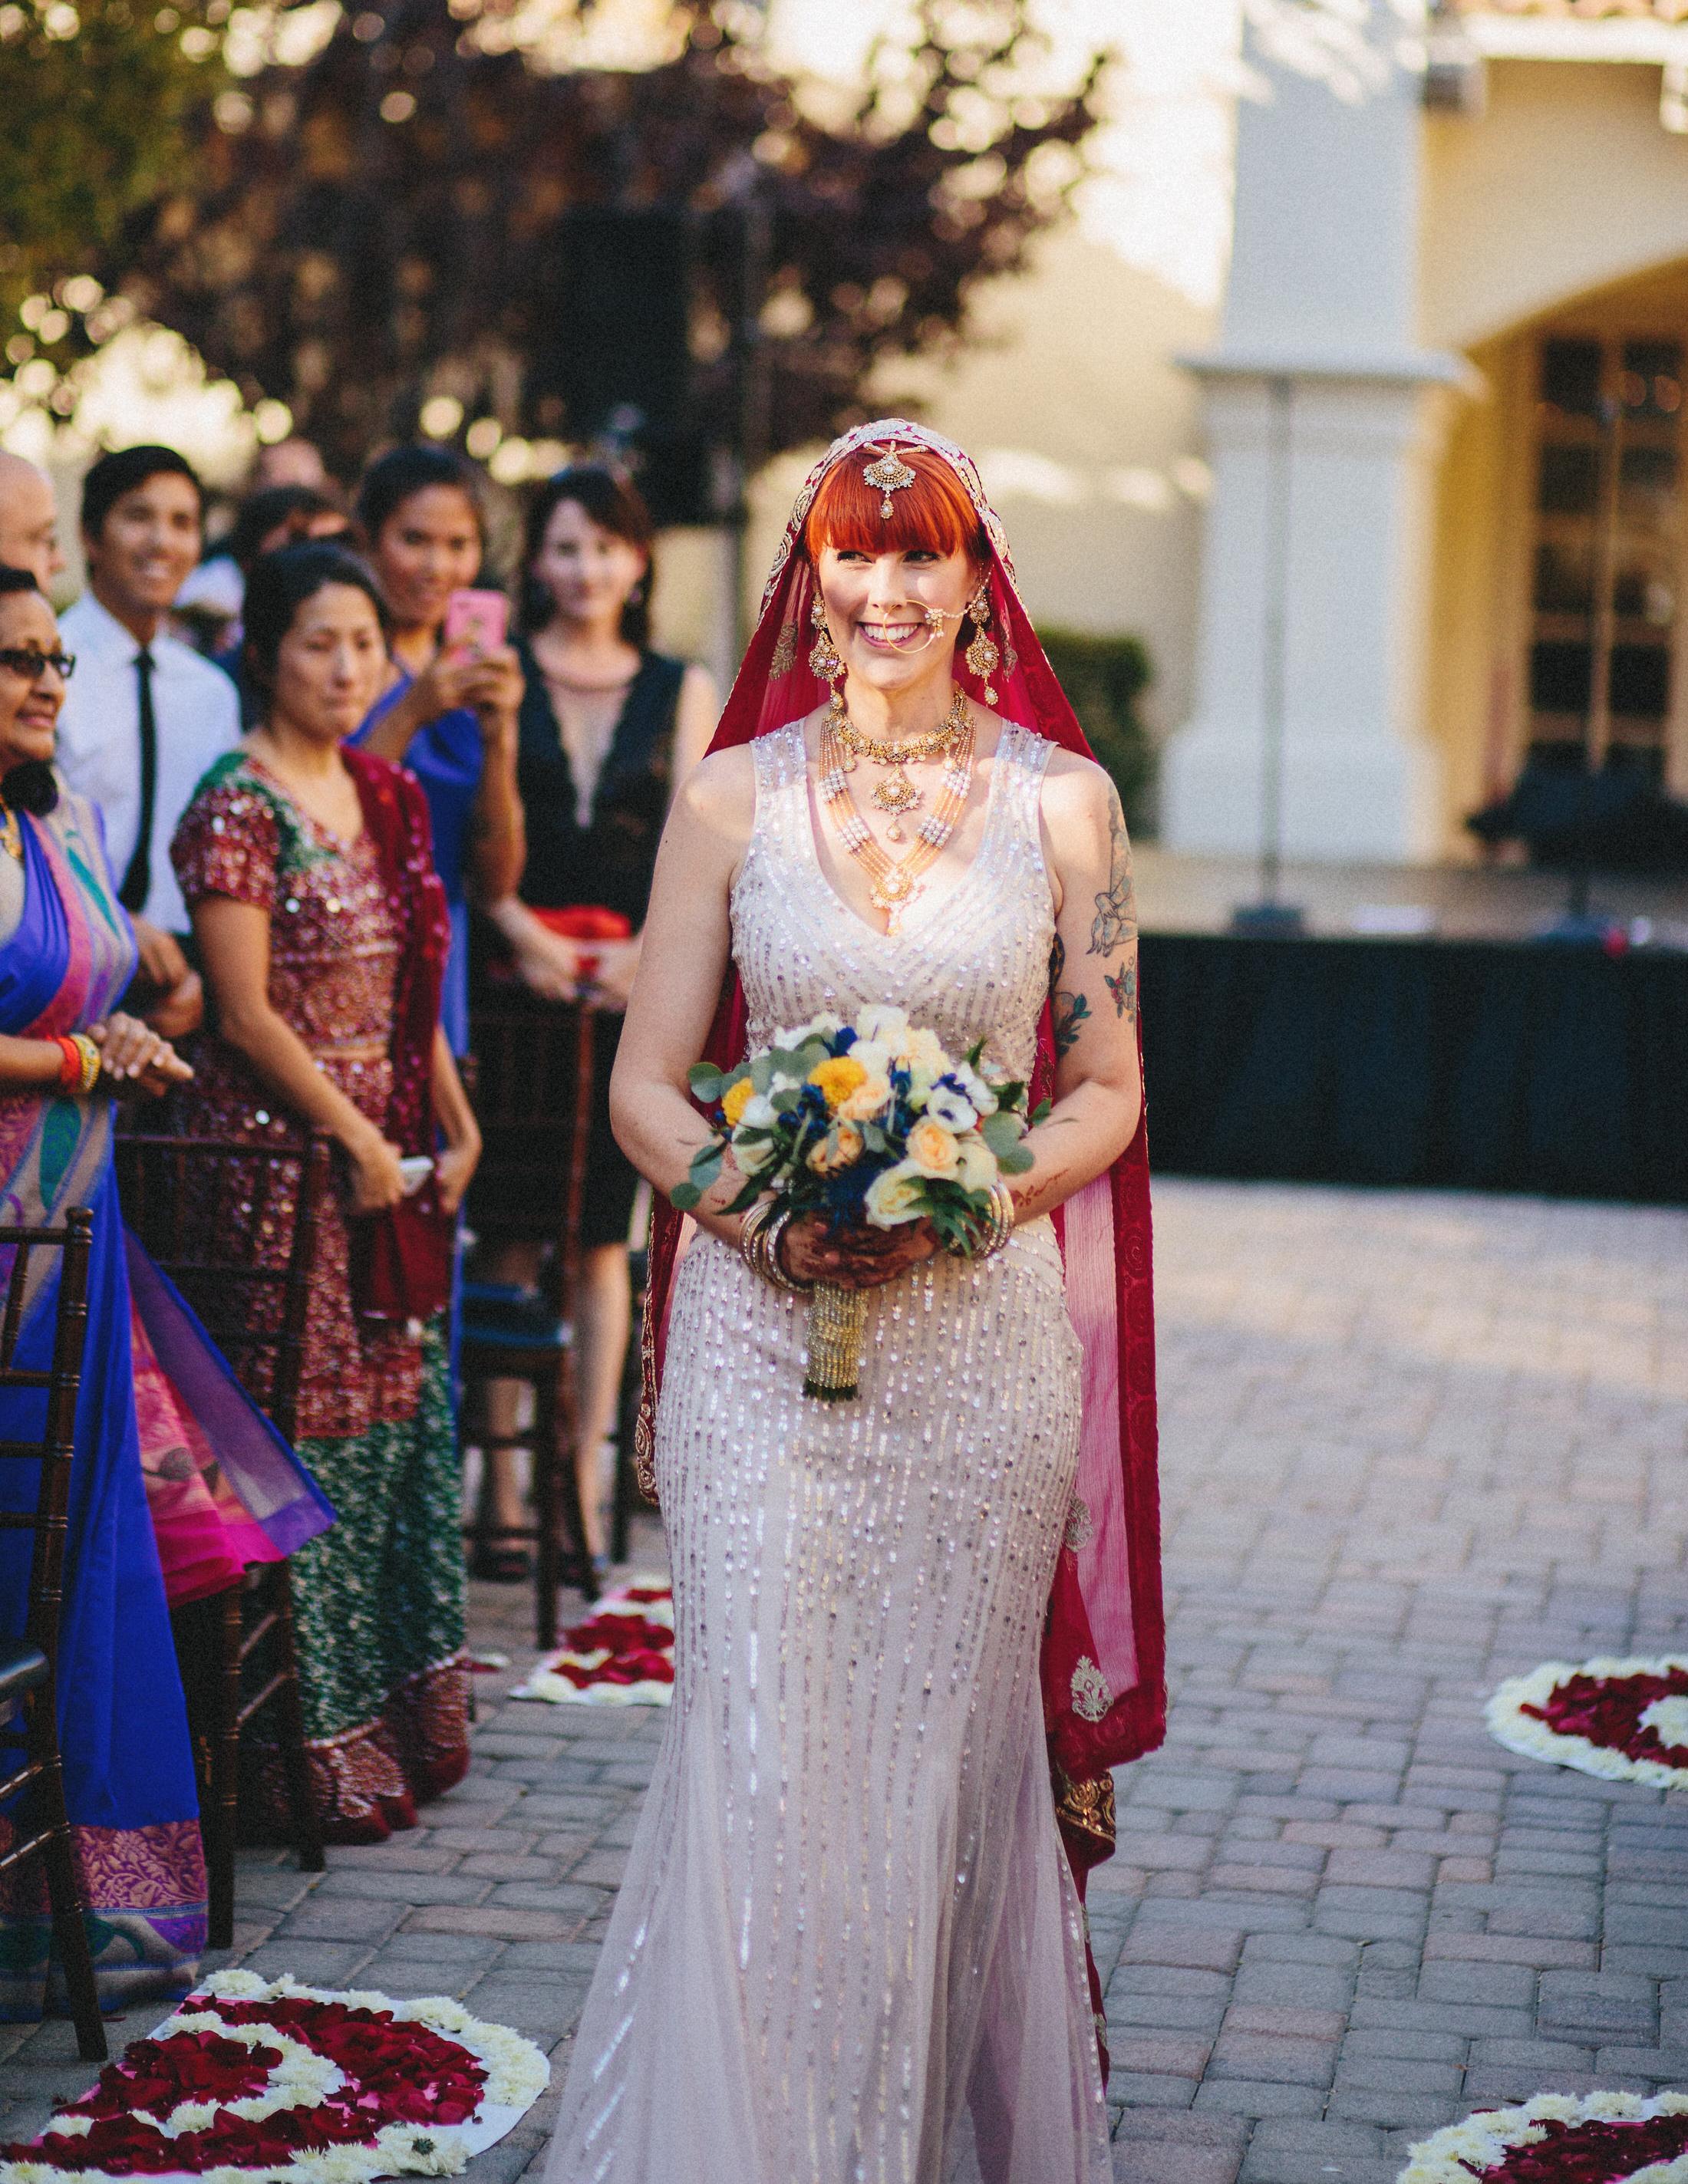 Modern-Indian-Serra-Plaza-wedding-054.jpg